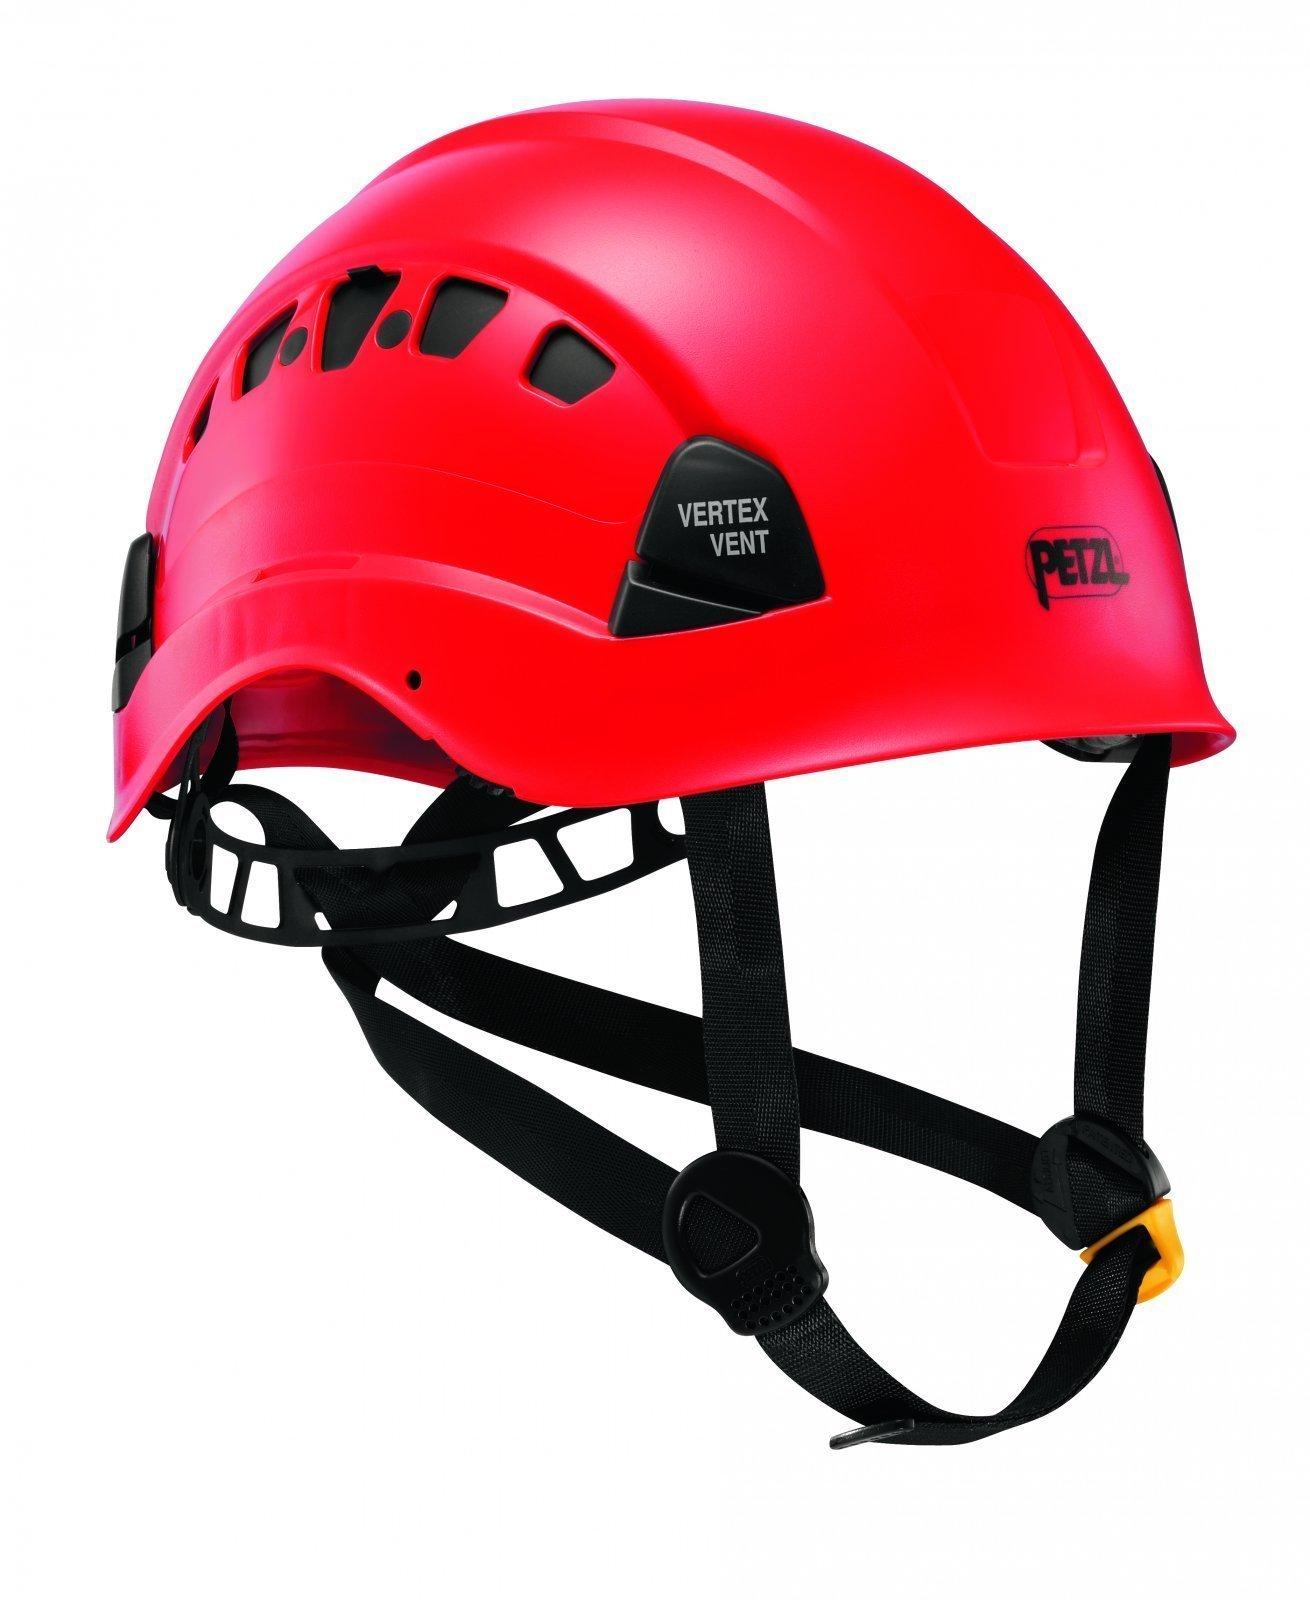 Petzl Helmets